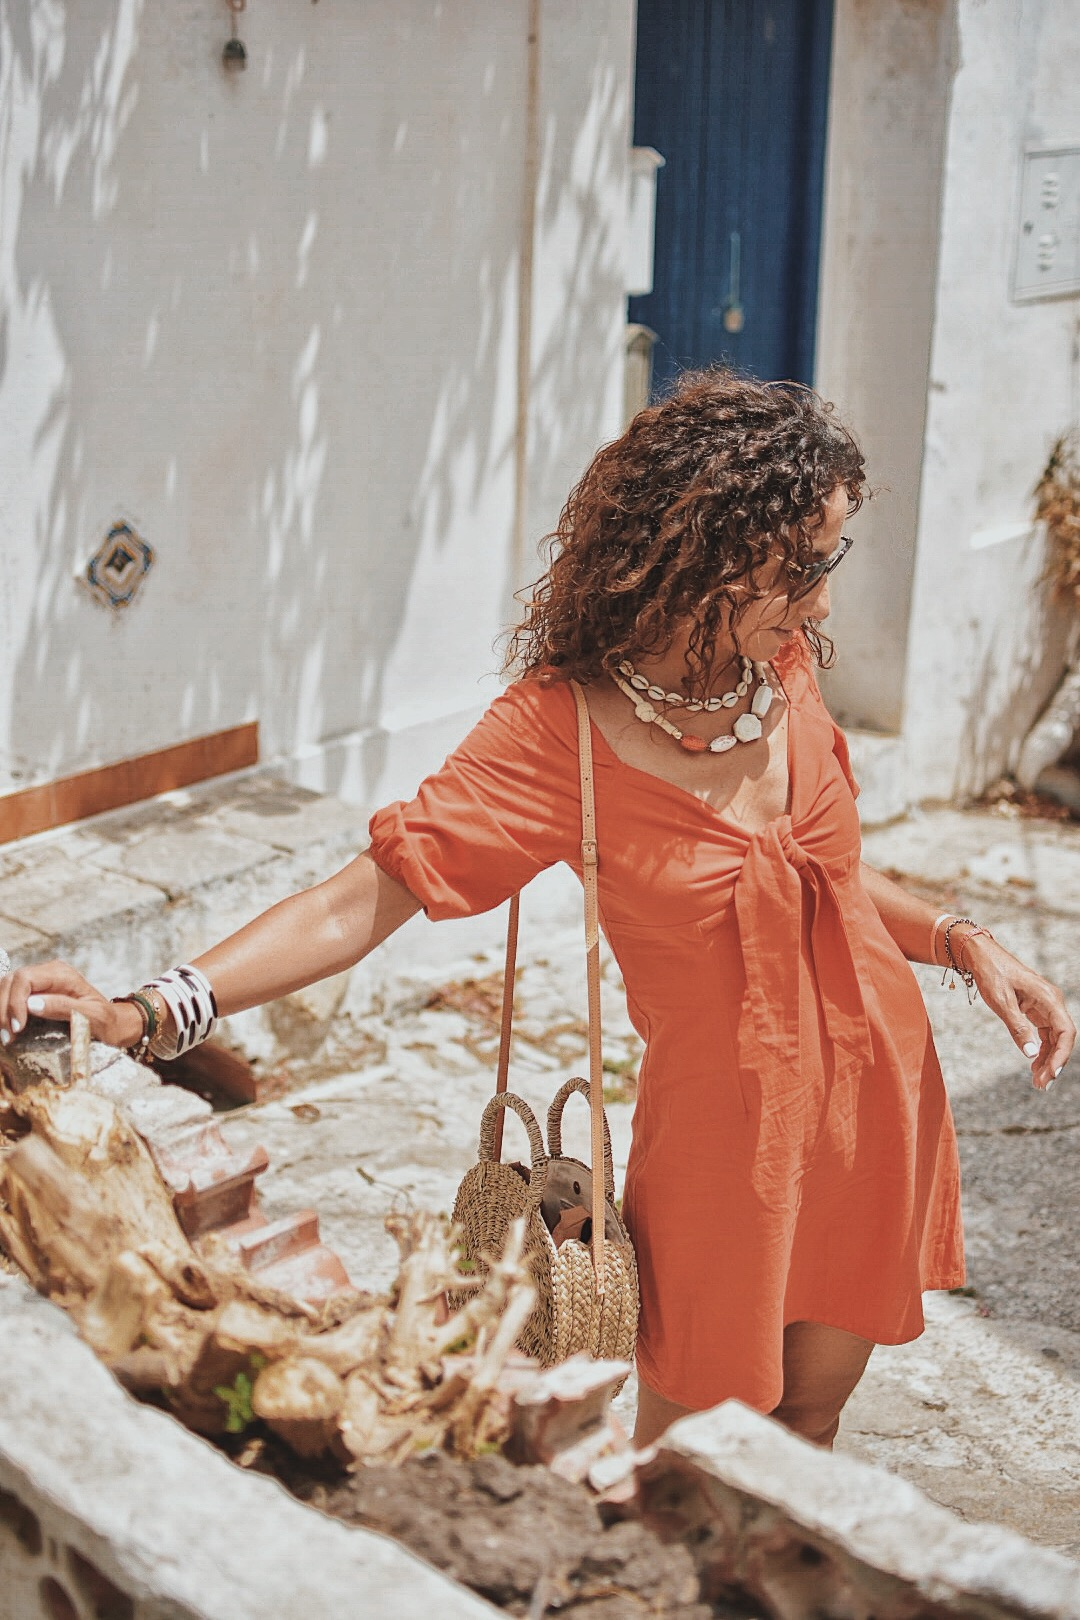 12-el-blog-de-silvia-vestido-naranja-tarifa